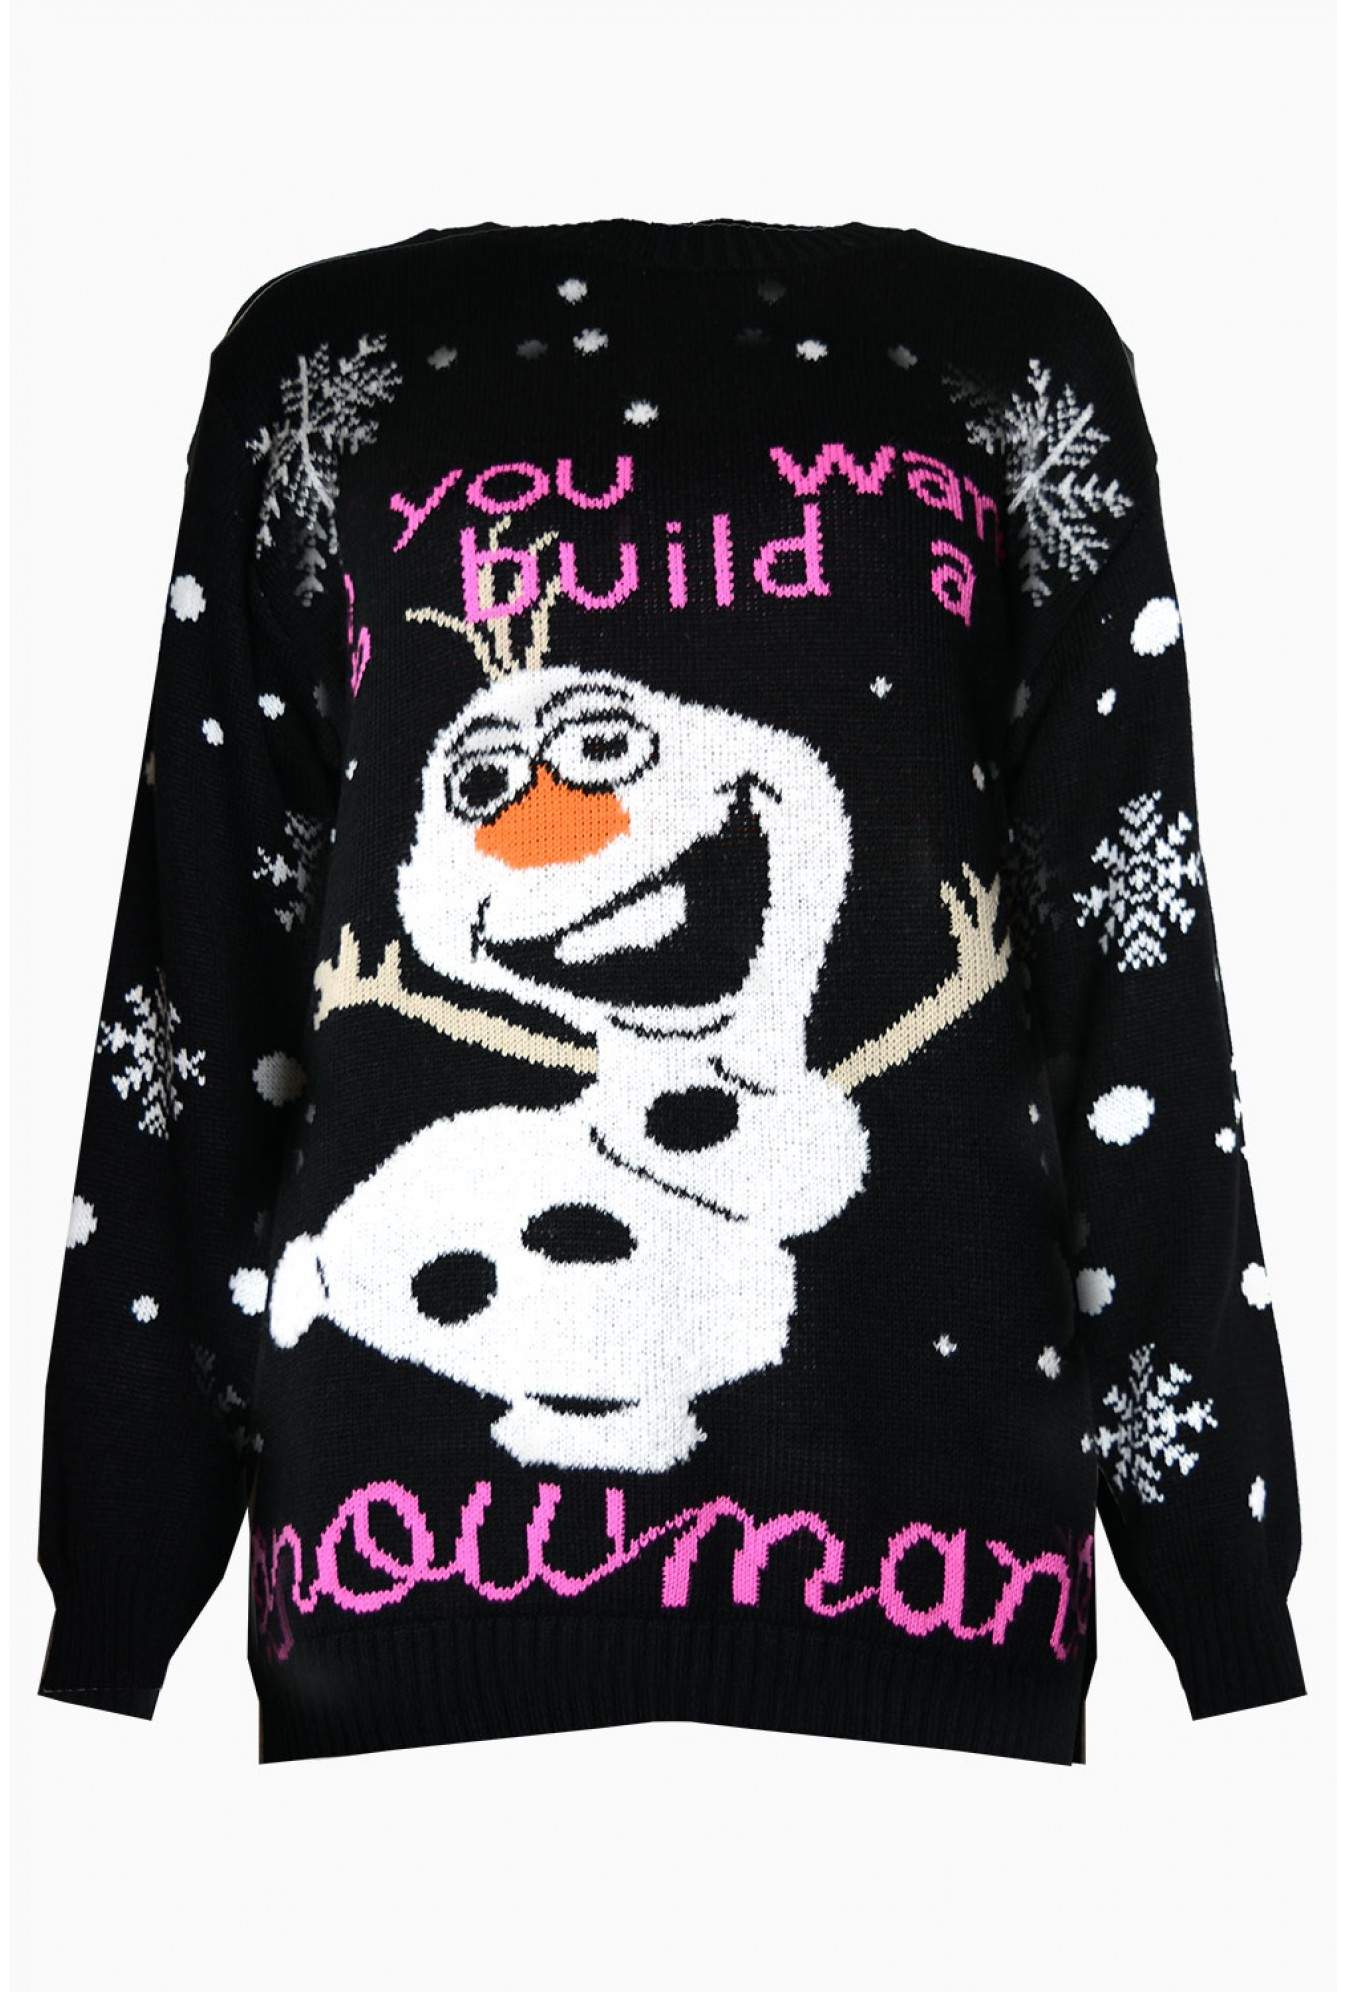 USCO Olaf Christmas Jumper in Black | iCLOTHING